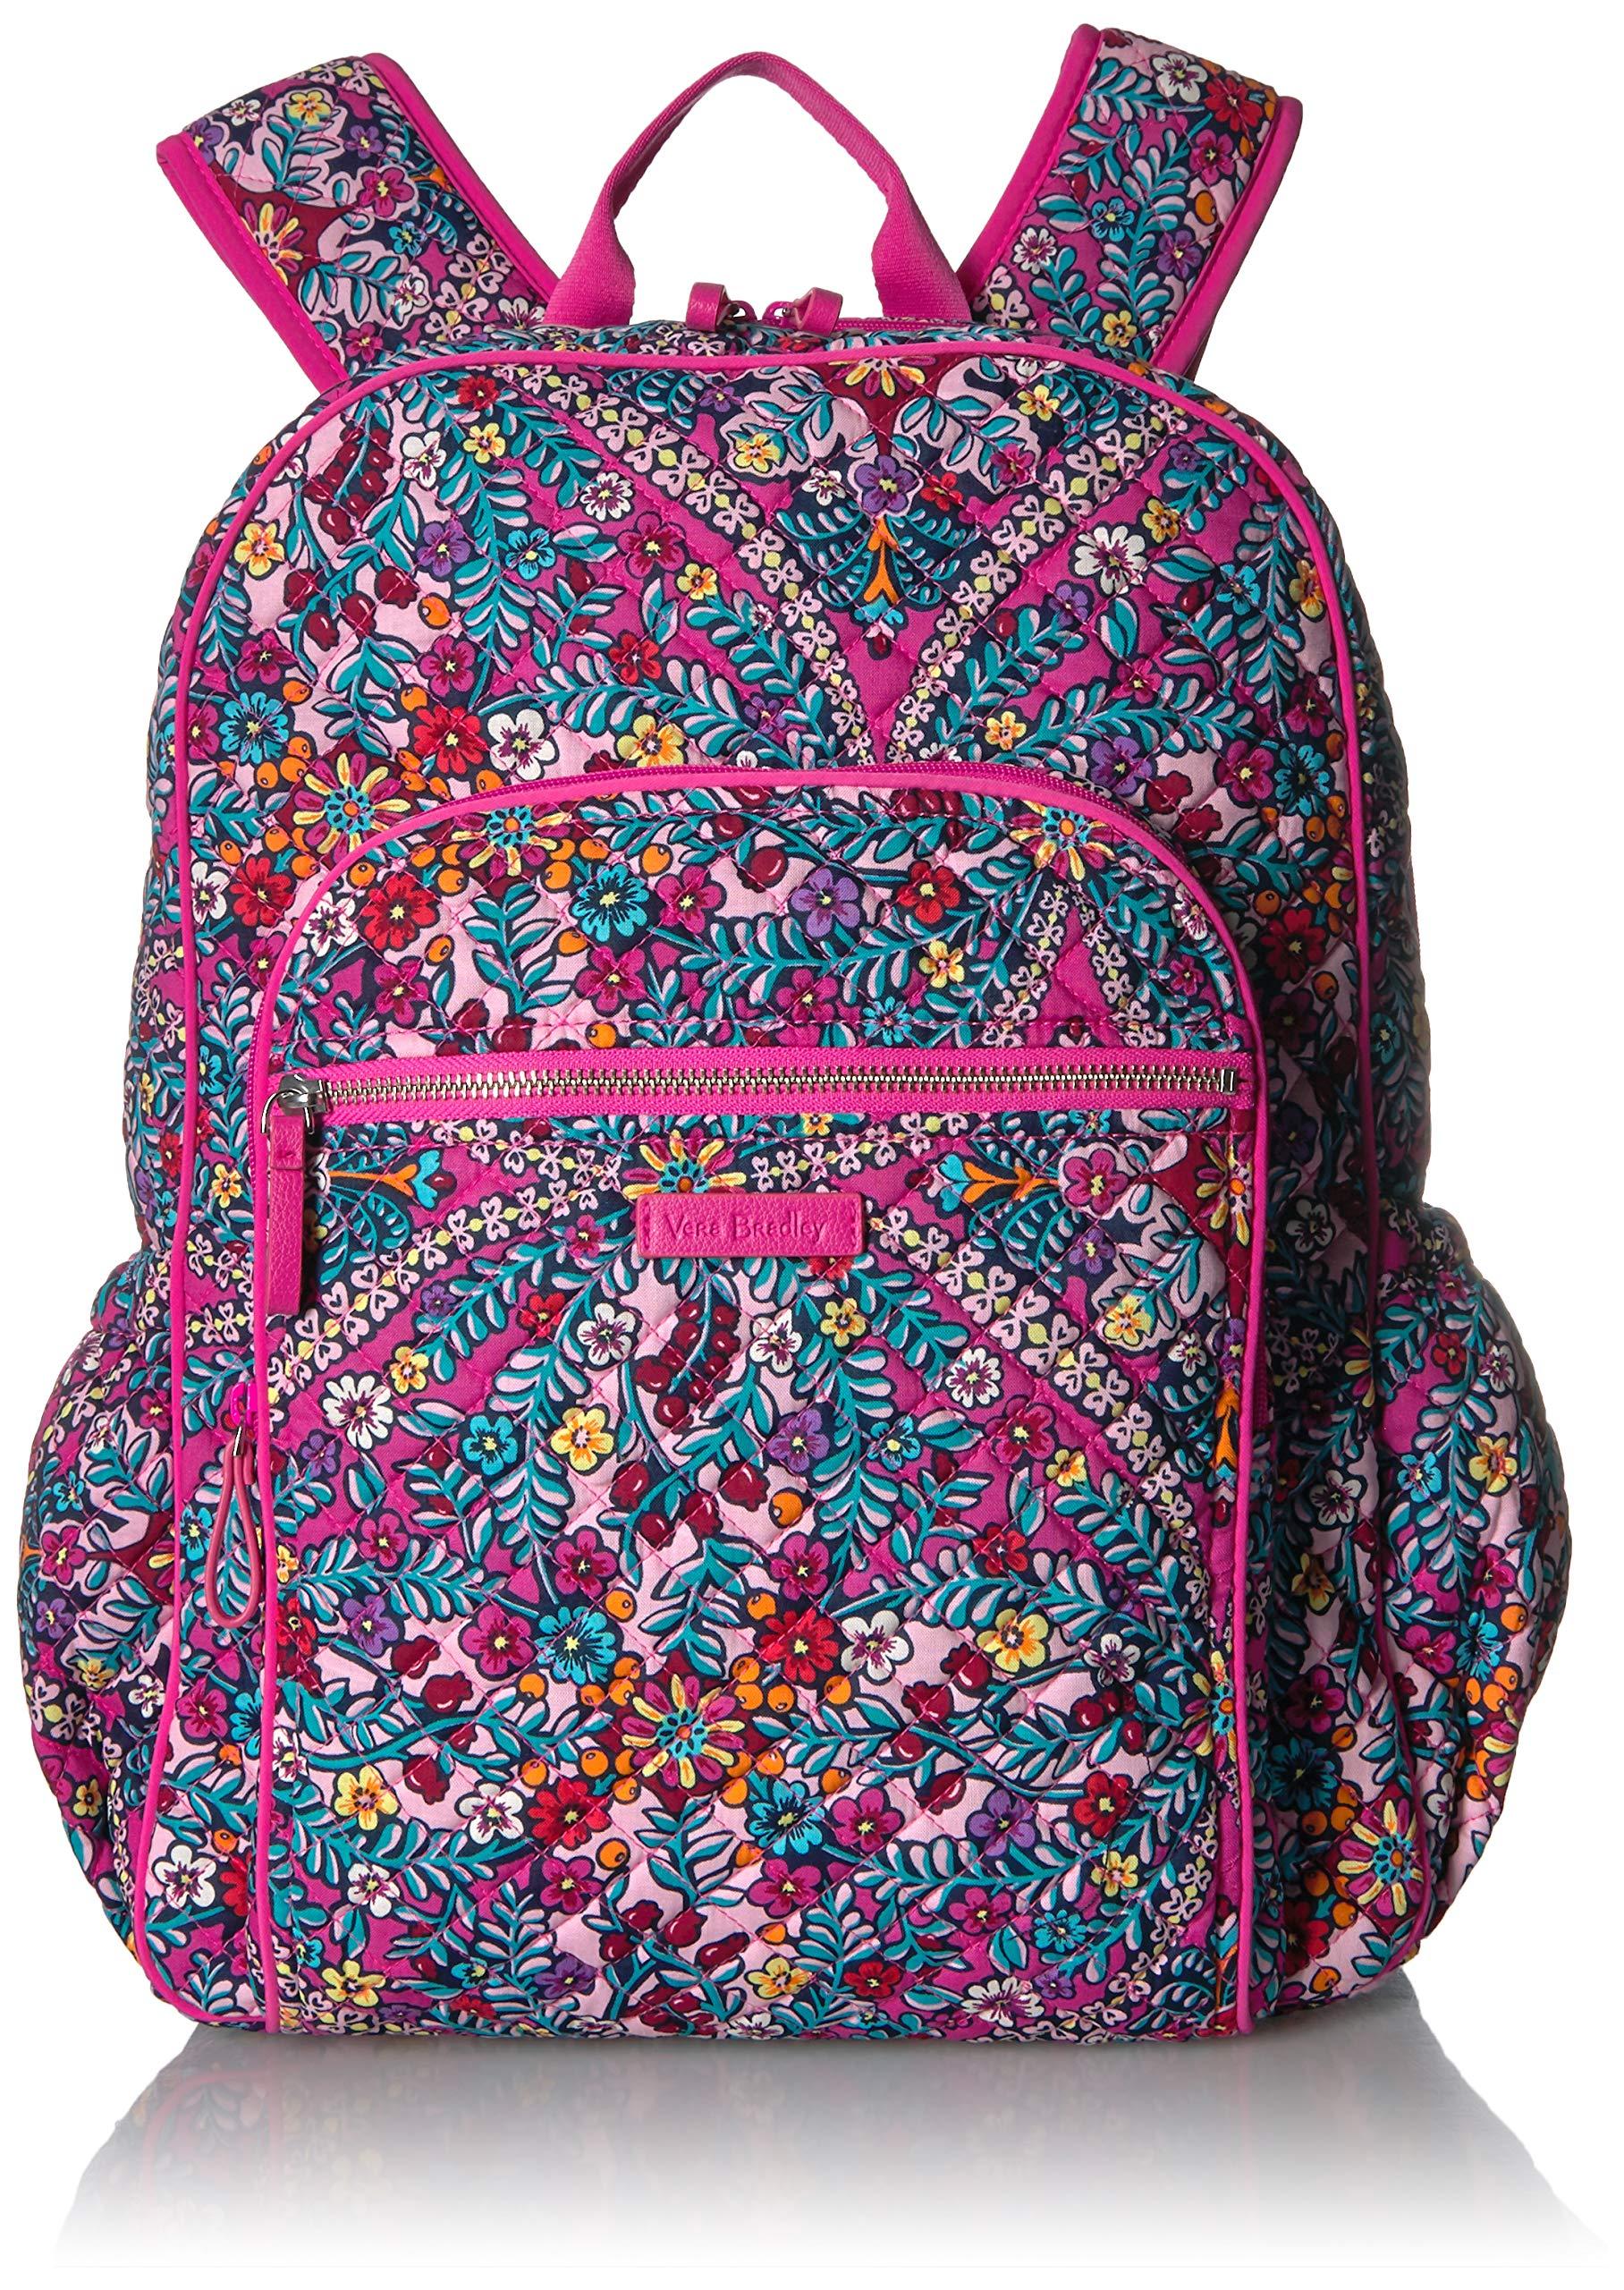 Vera Bradley Iconic Campus Backpack, Signature Cotton, Kaleidoscope